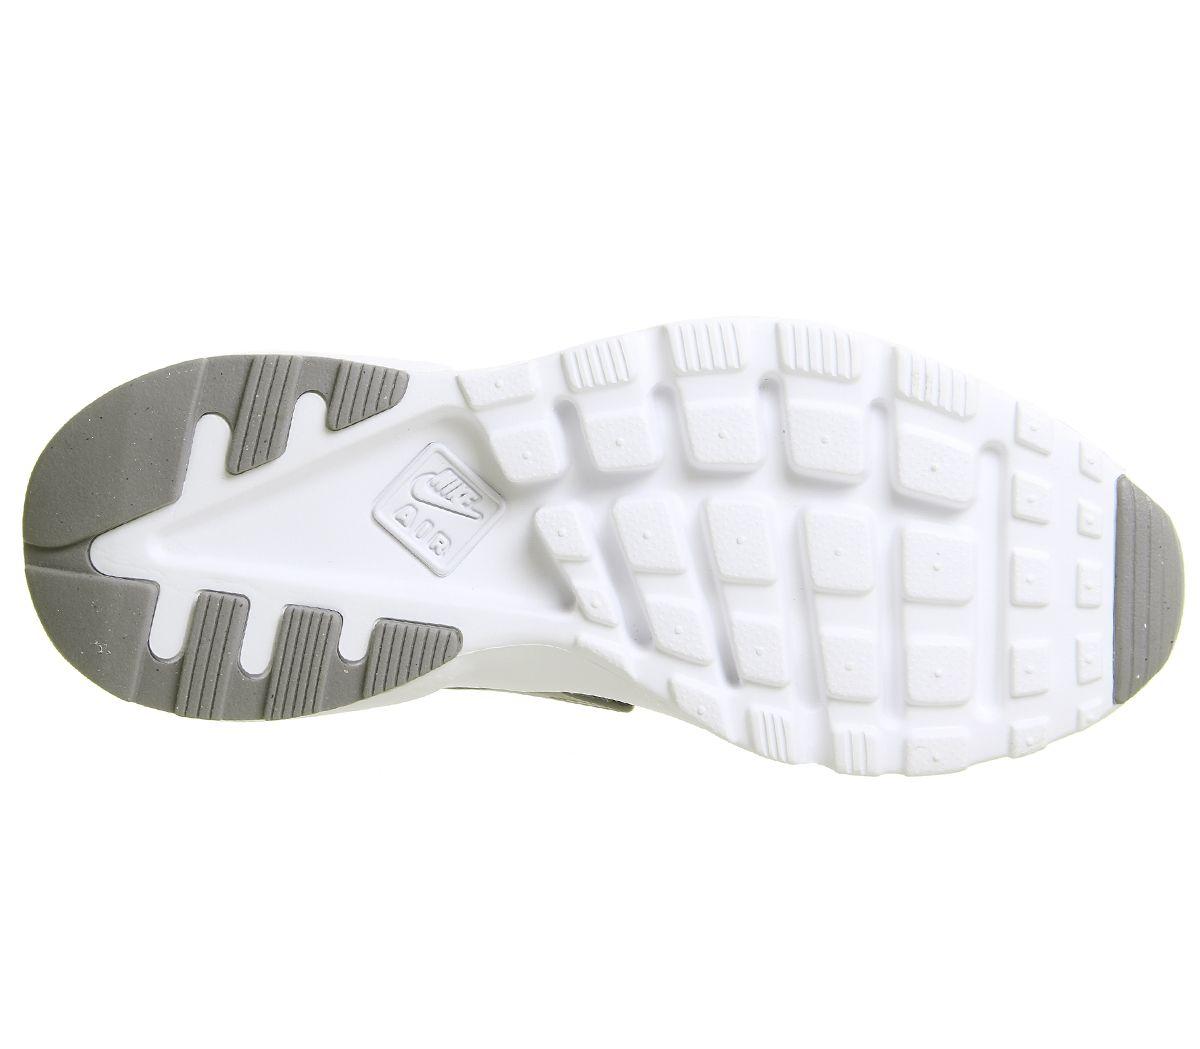 cb945fc5f320 Nike Huarache Ultra Gs Gunsmoke Metallic Silver White - Hers trainers